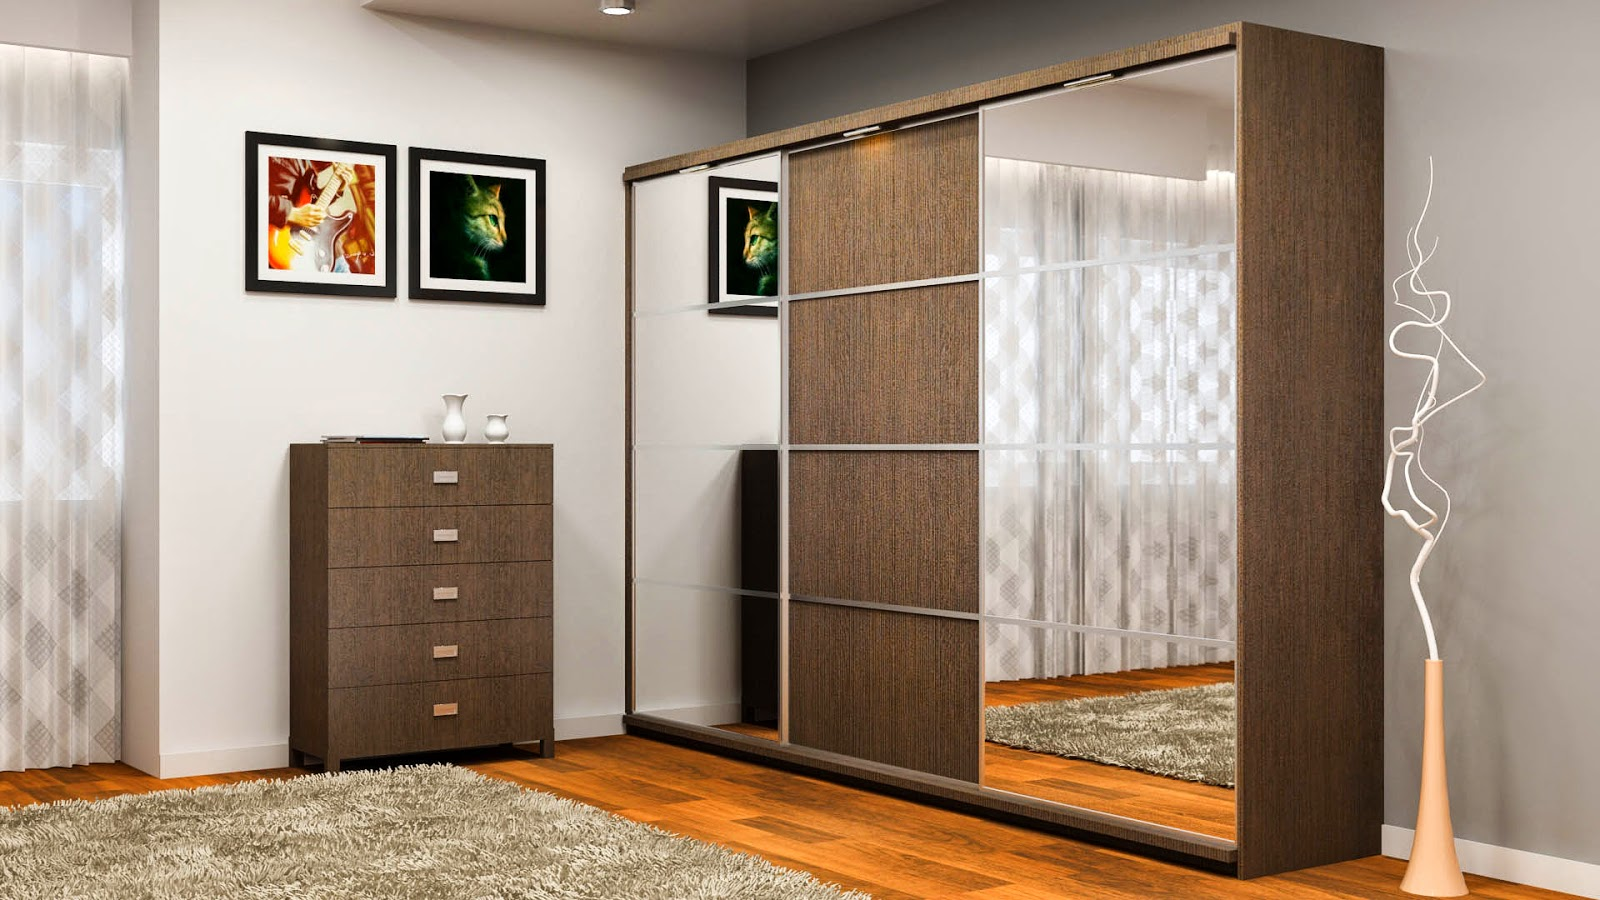 Bedroom Wardrobes | Interior Decor Blog - Customfurnish.com